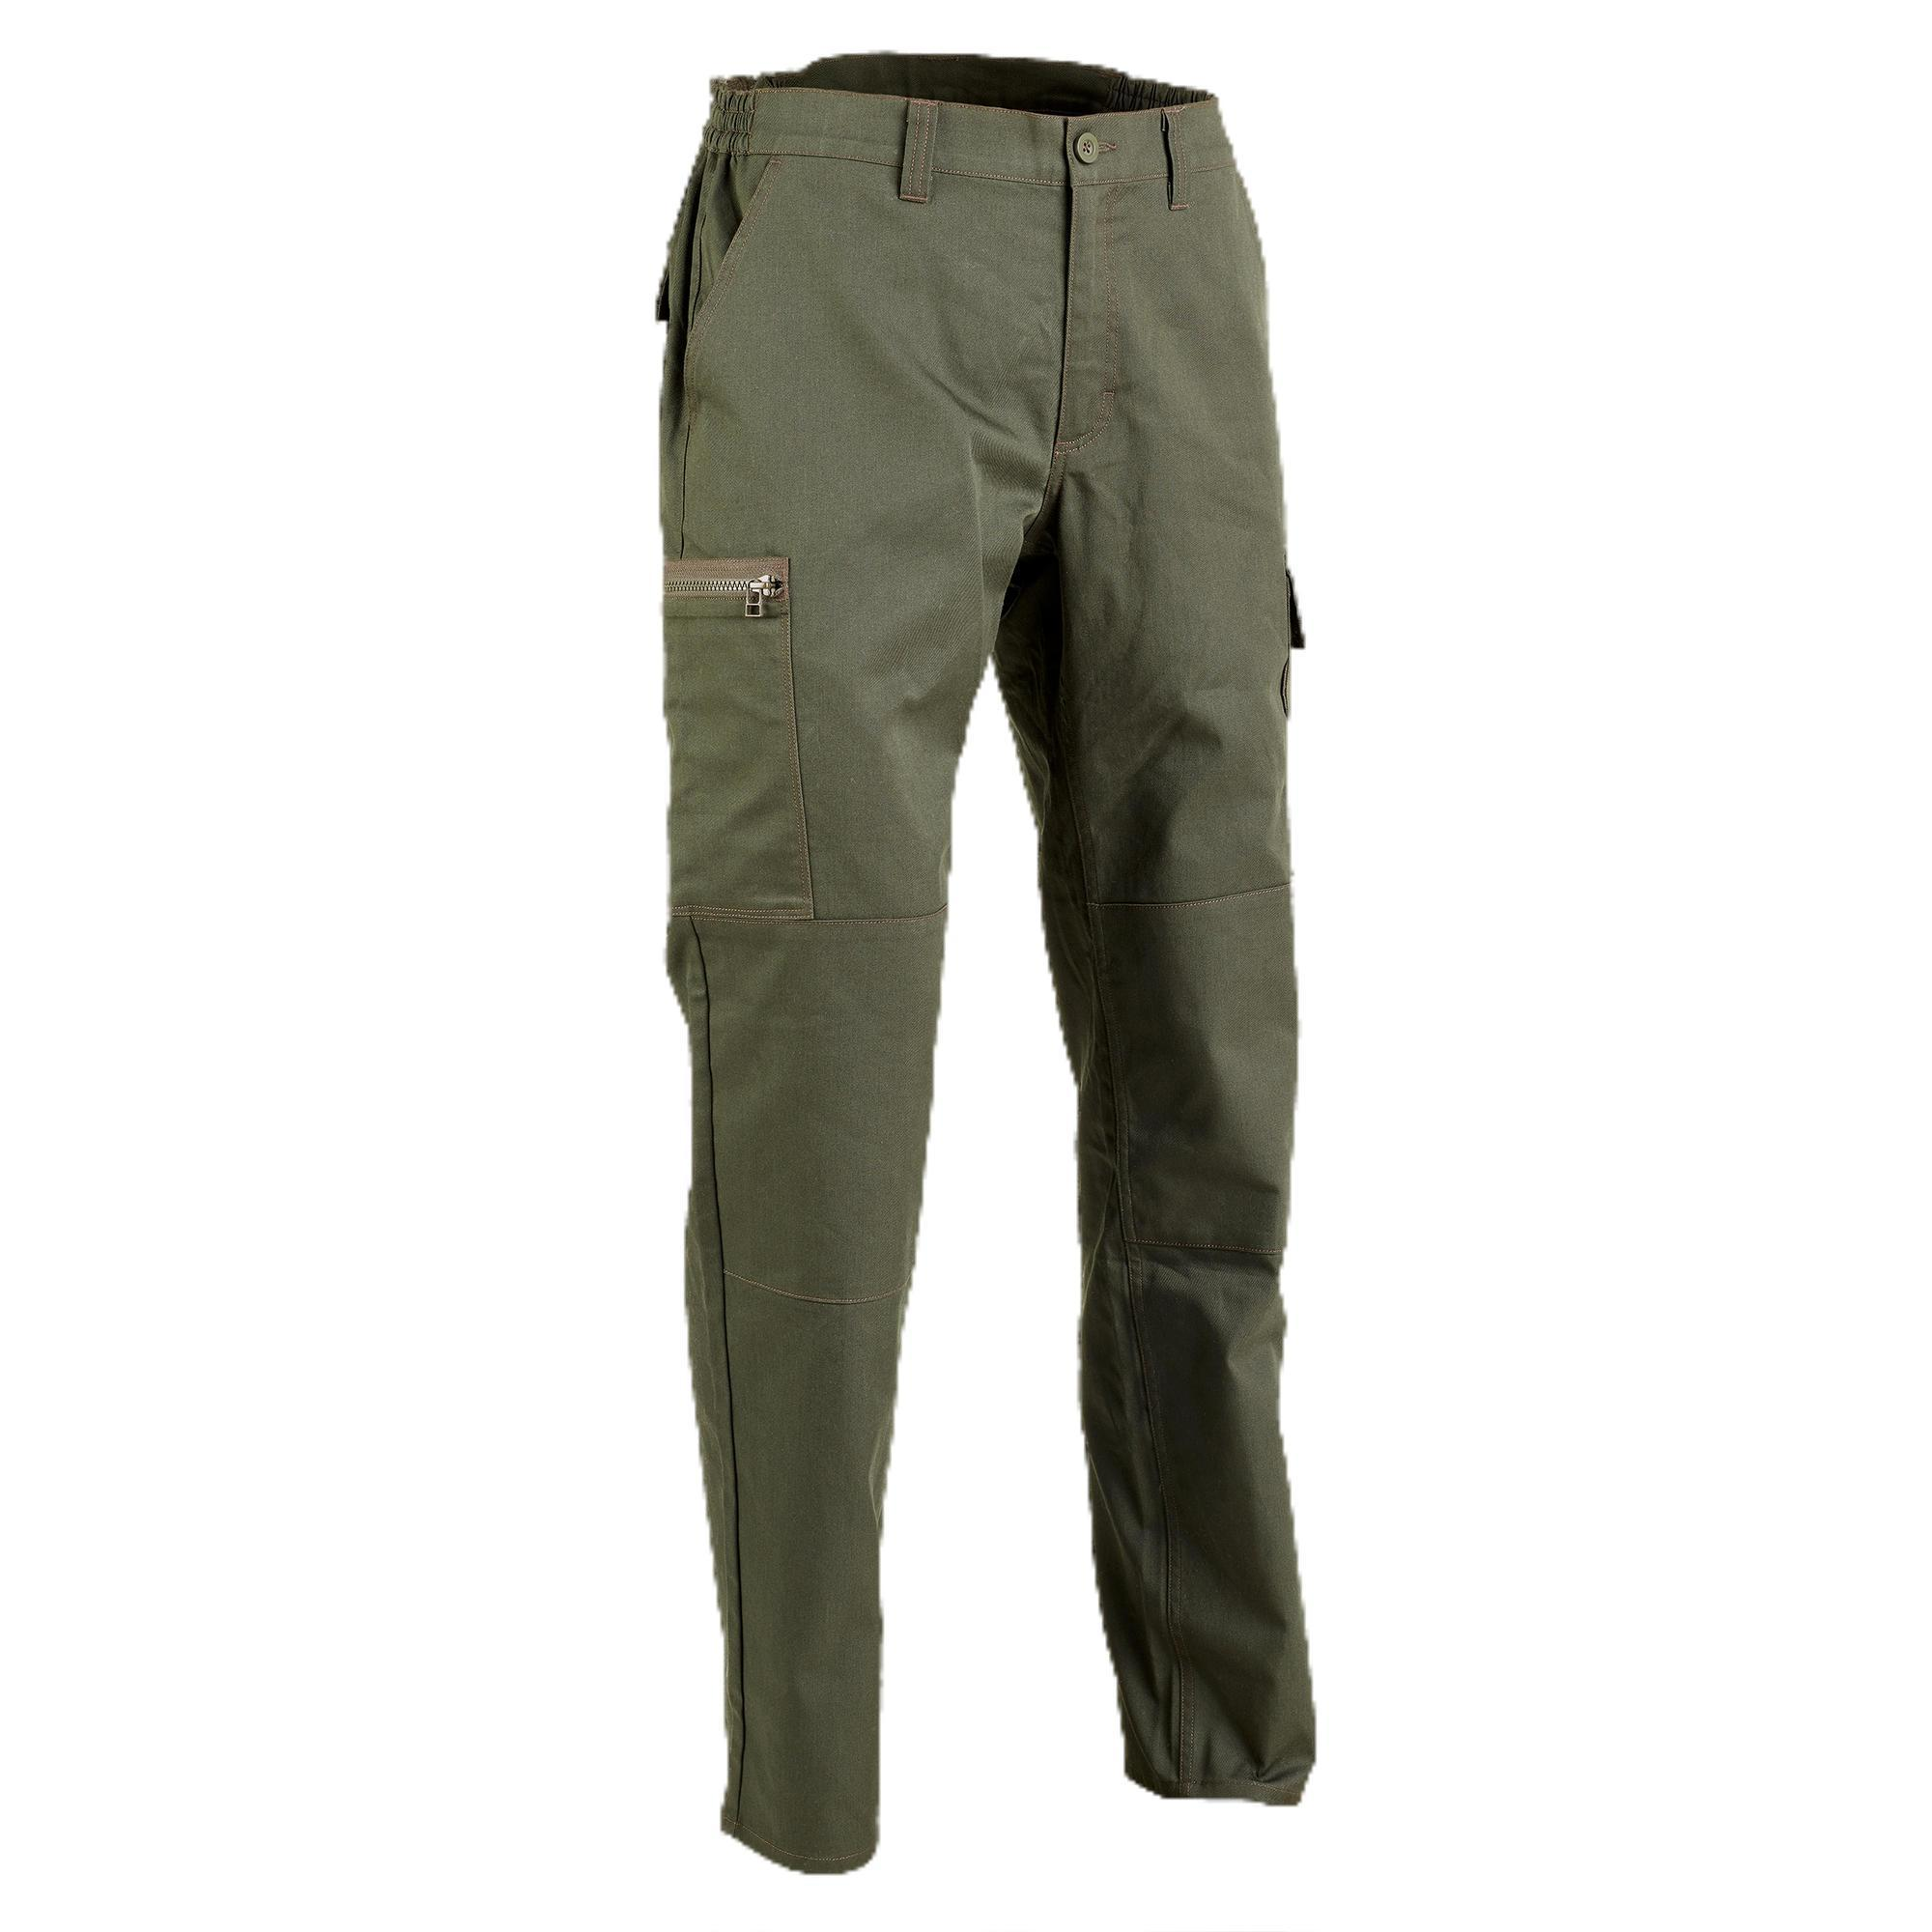 Jagdhose Steppe 300 Limitierte Edition grün   Sportbekleidung > Sporthosen > Trekkinghosen   Solognac